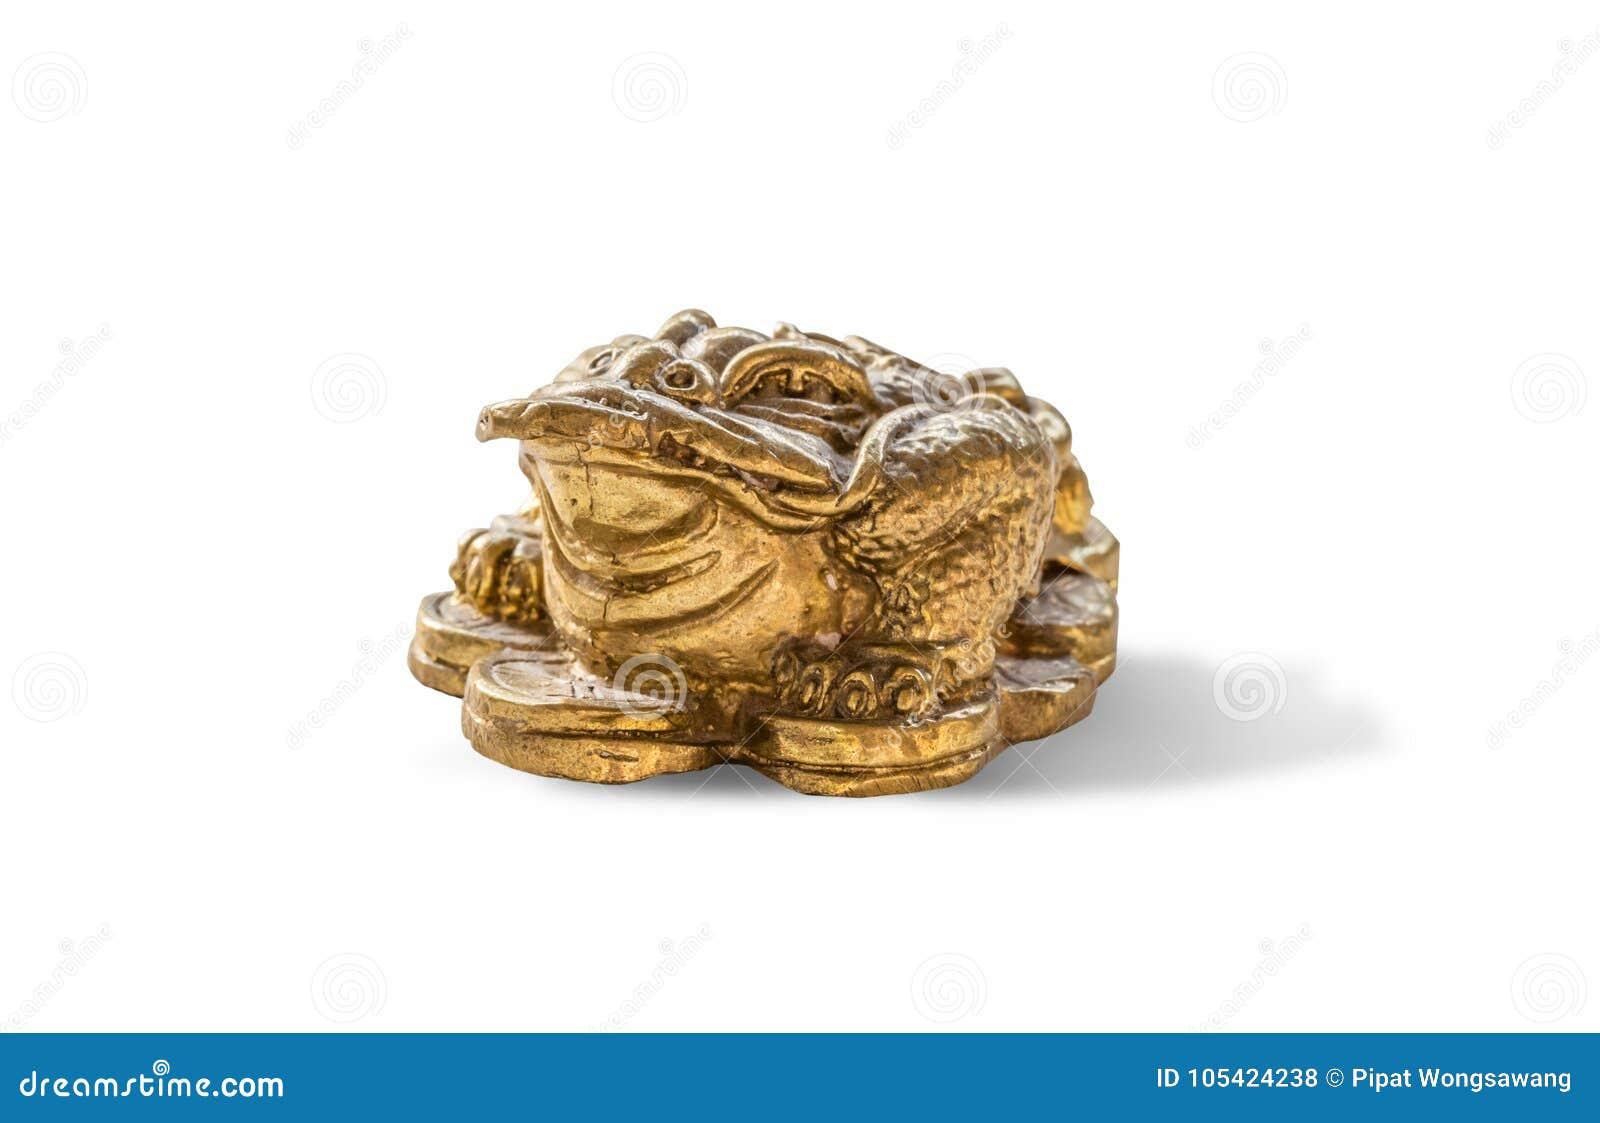 Cash mascot - Chan Chu - a gold frog figurine sitting on coins